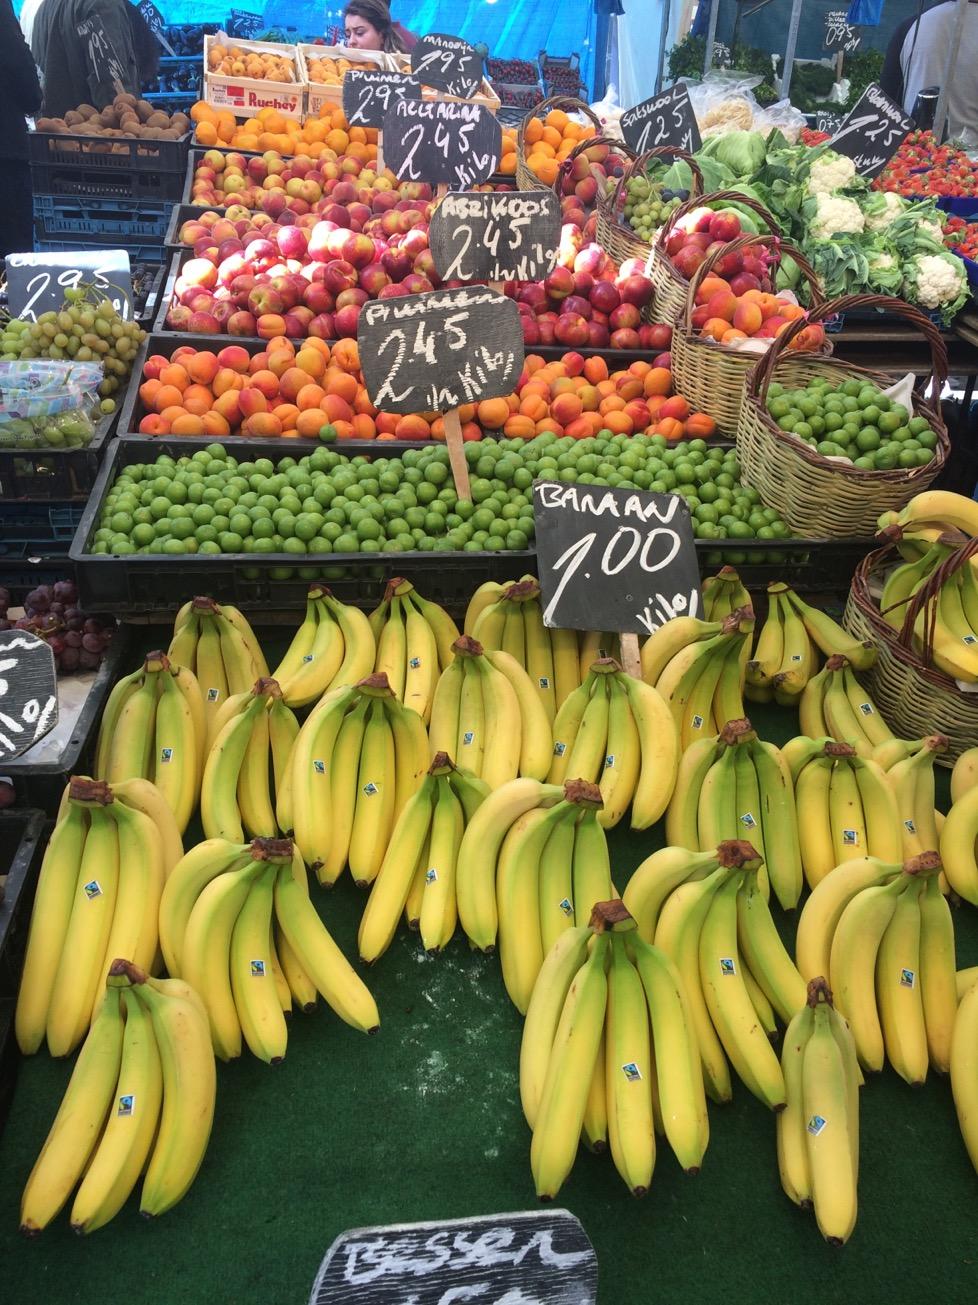 Rotterdam market, the Netherlands